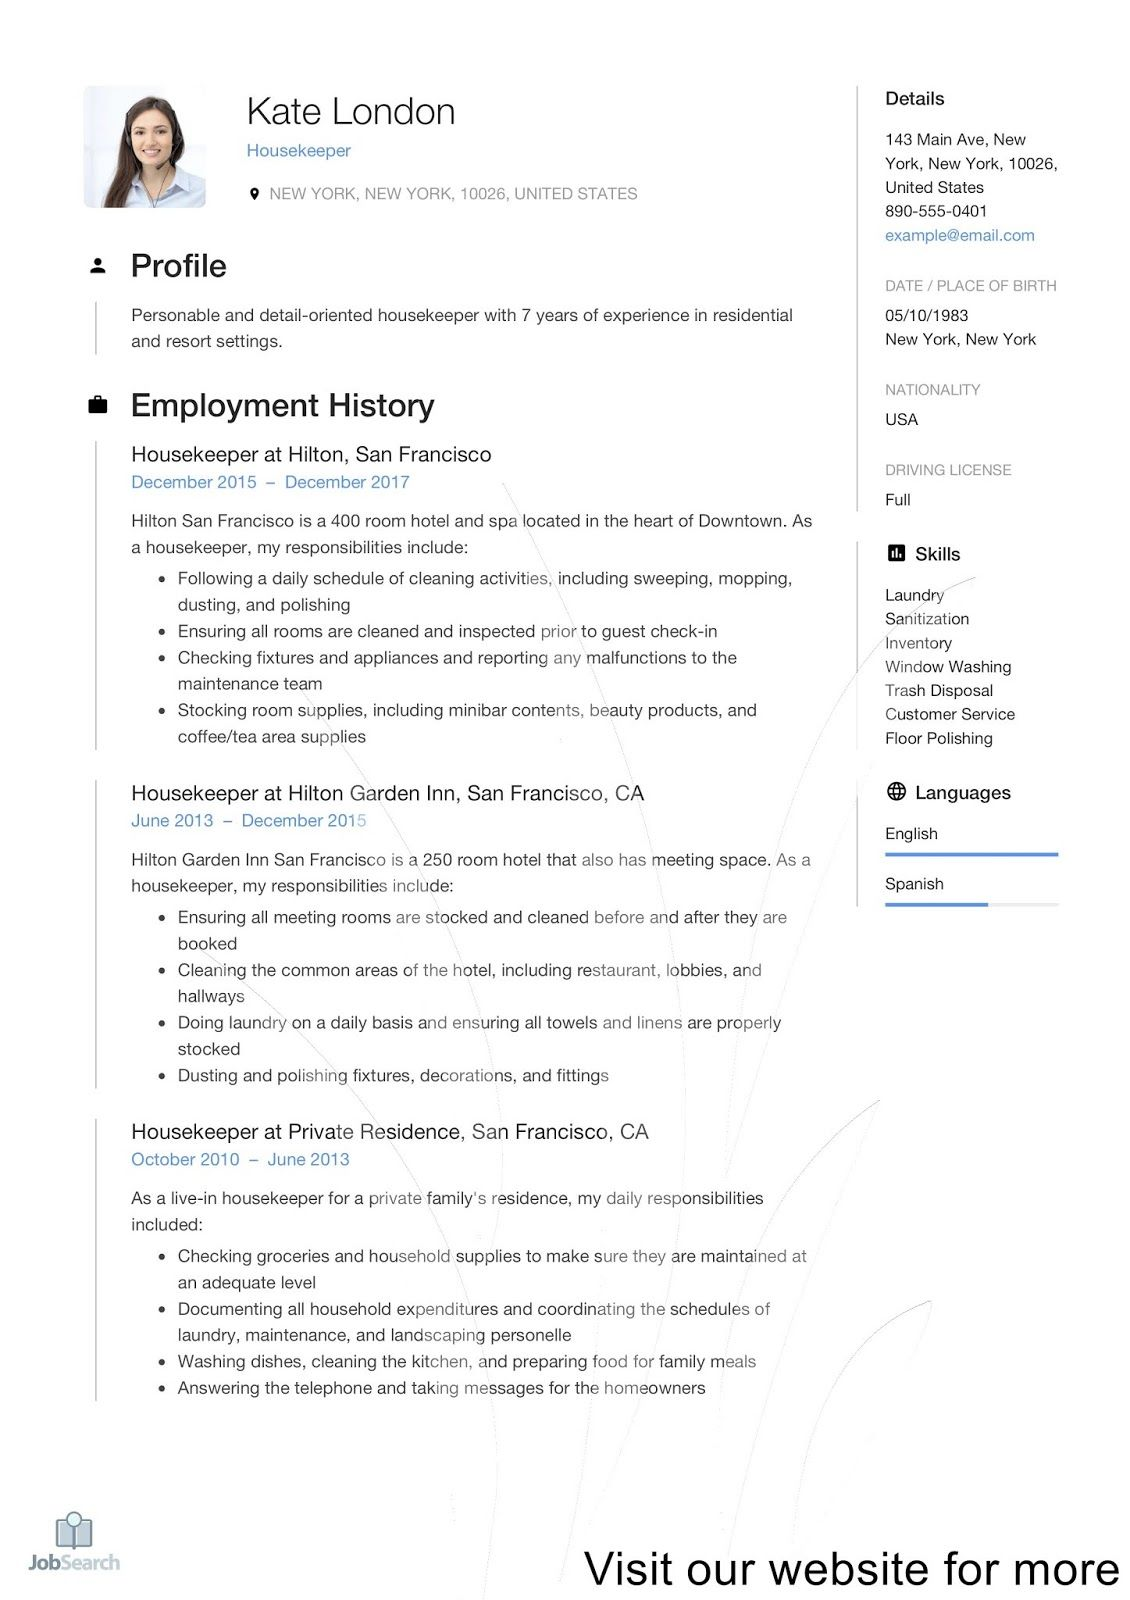 Housekeeping Description For Resume 2021 Housekeeping